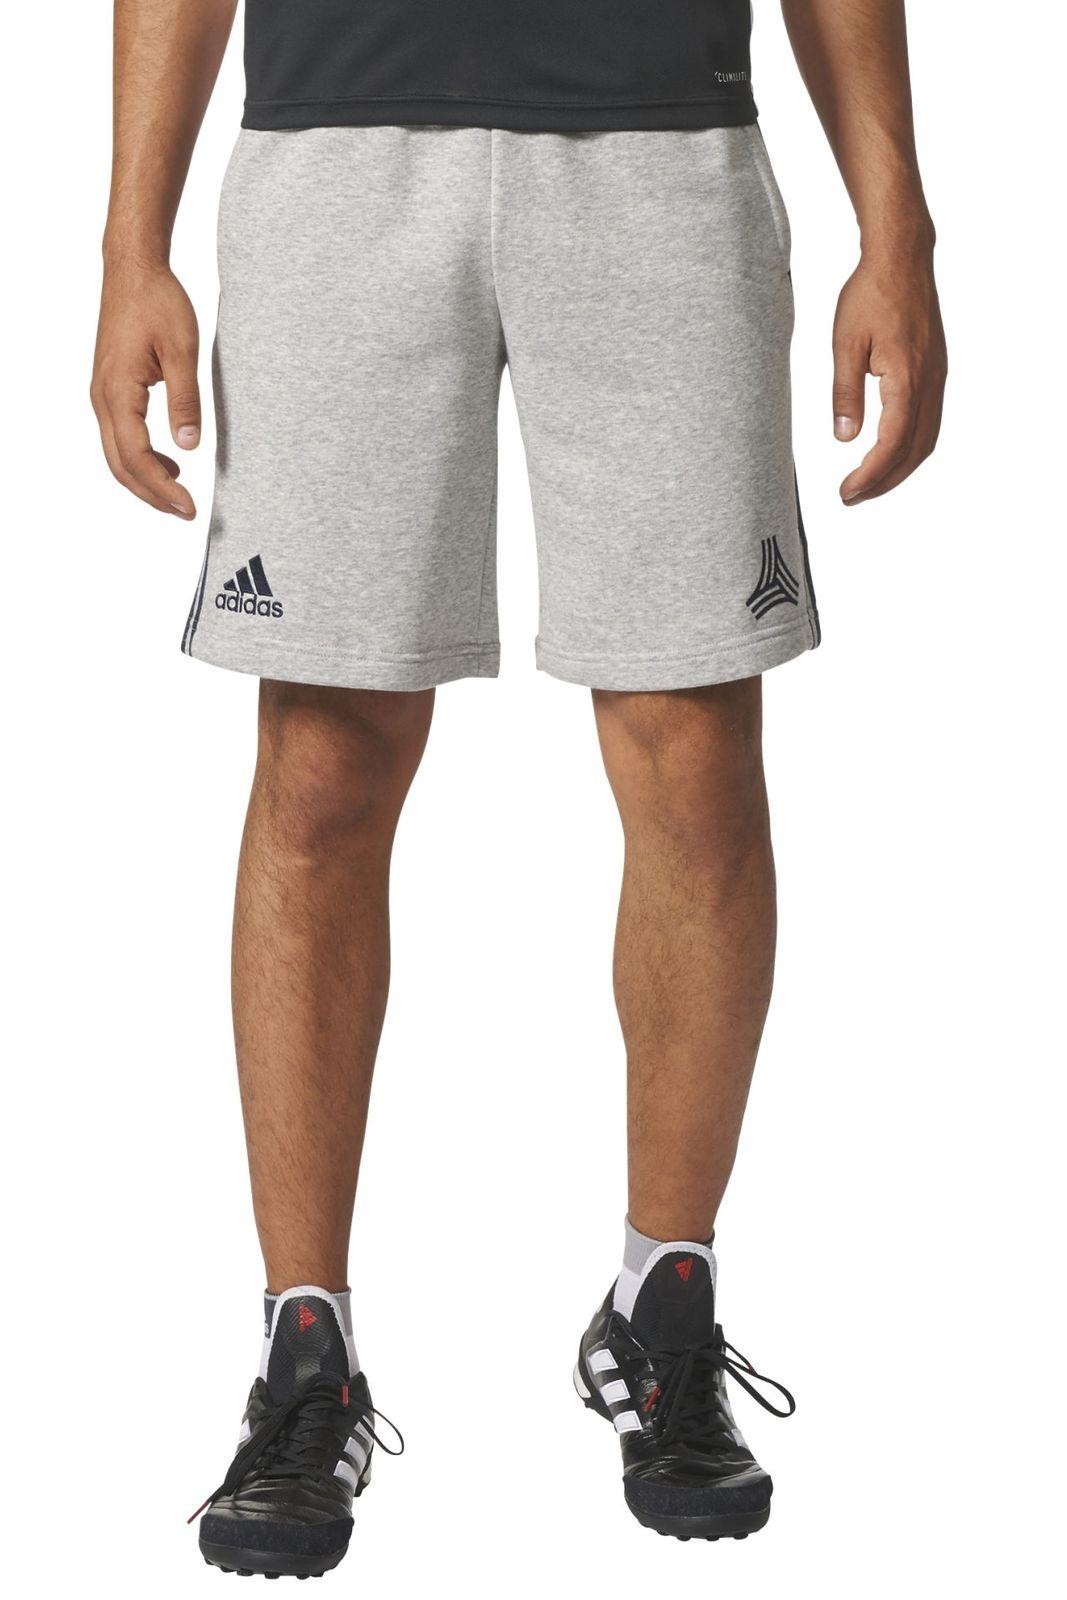 adidas herren fussball sport short sport tansweat shorts grau blau. Black Bedroom Furniture Sets. Home Design Ideas